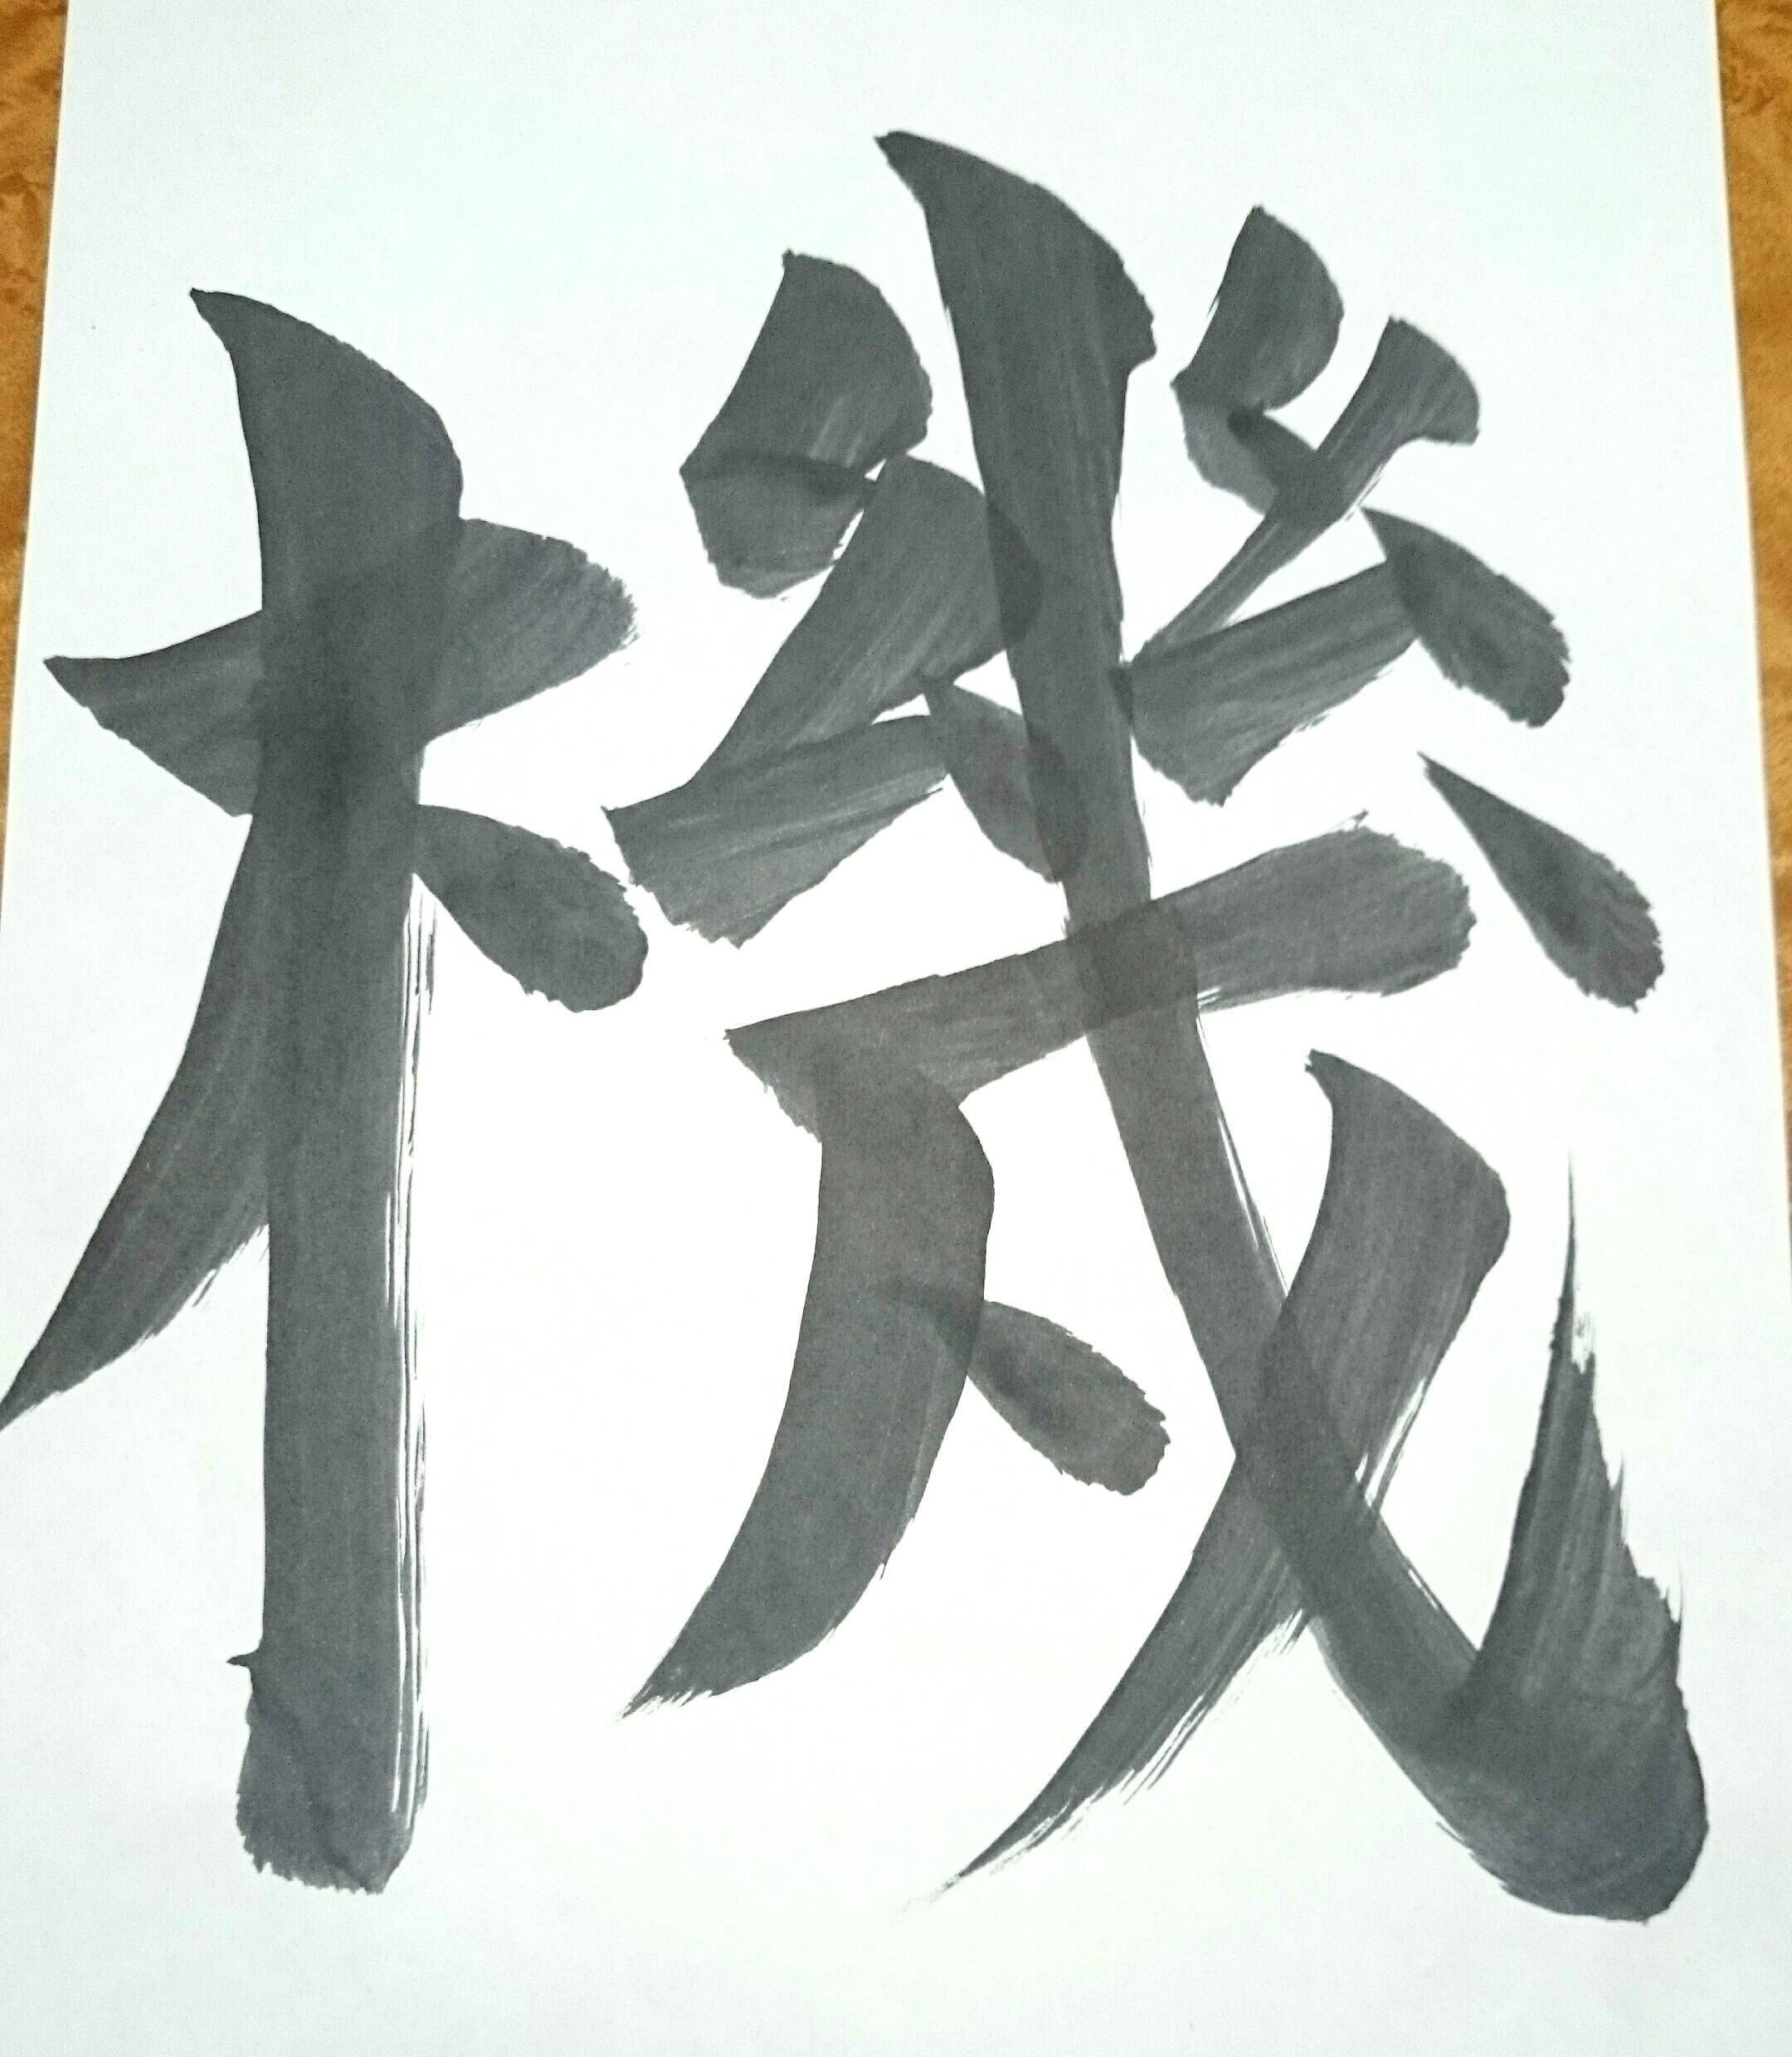 石毛宏典の画像 p1_26